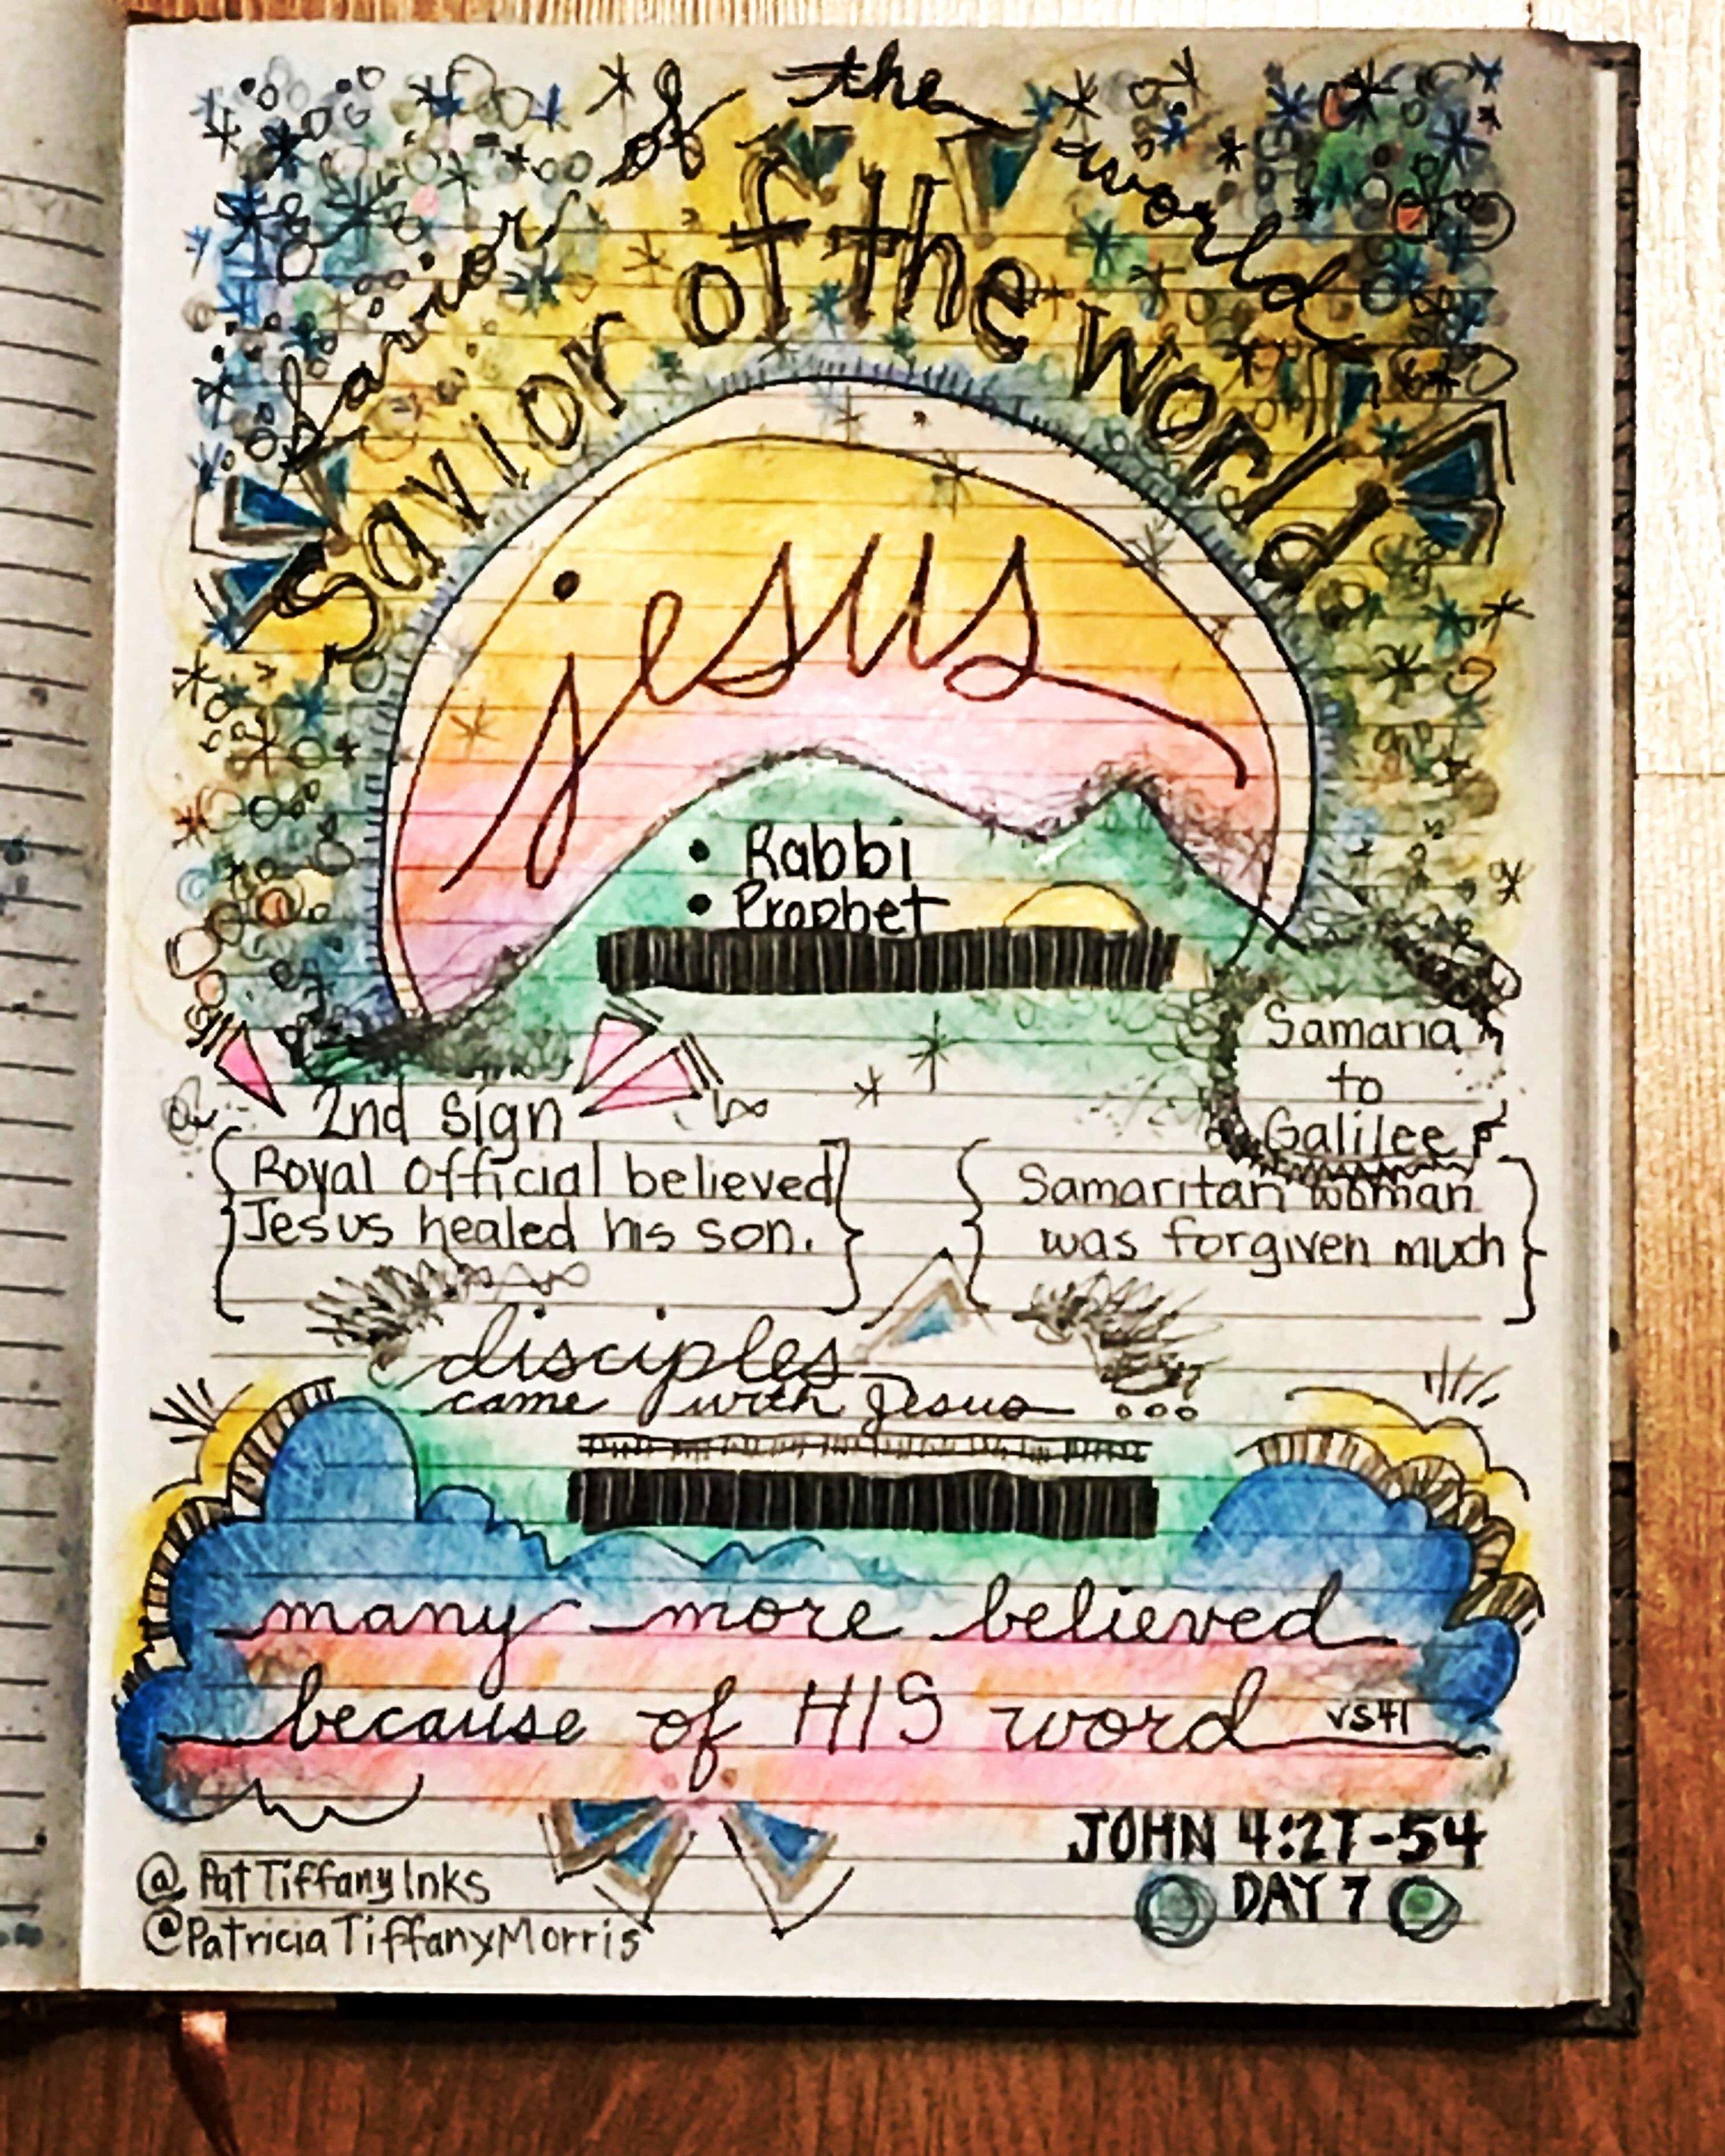 #christiancreative #biblescripture #biblejournaling #illustratedjournal #patriciatiffanymorriswriter